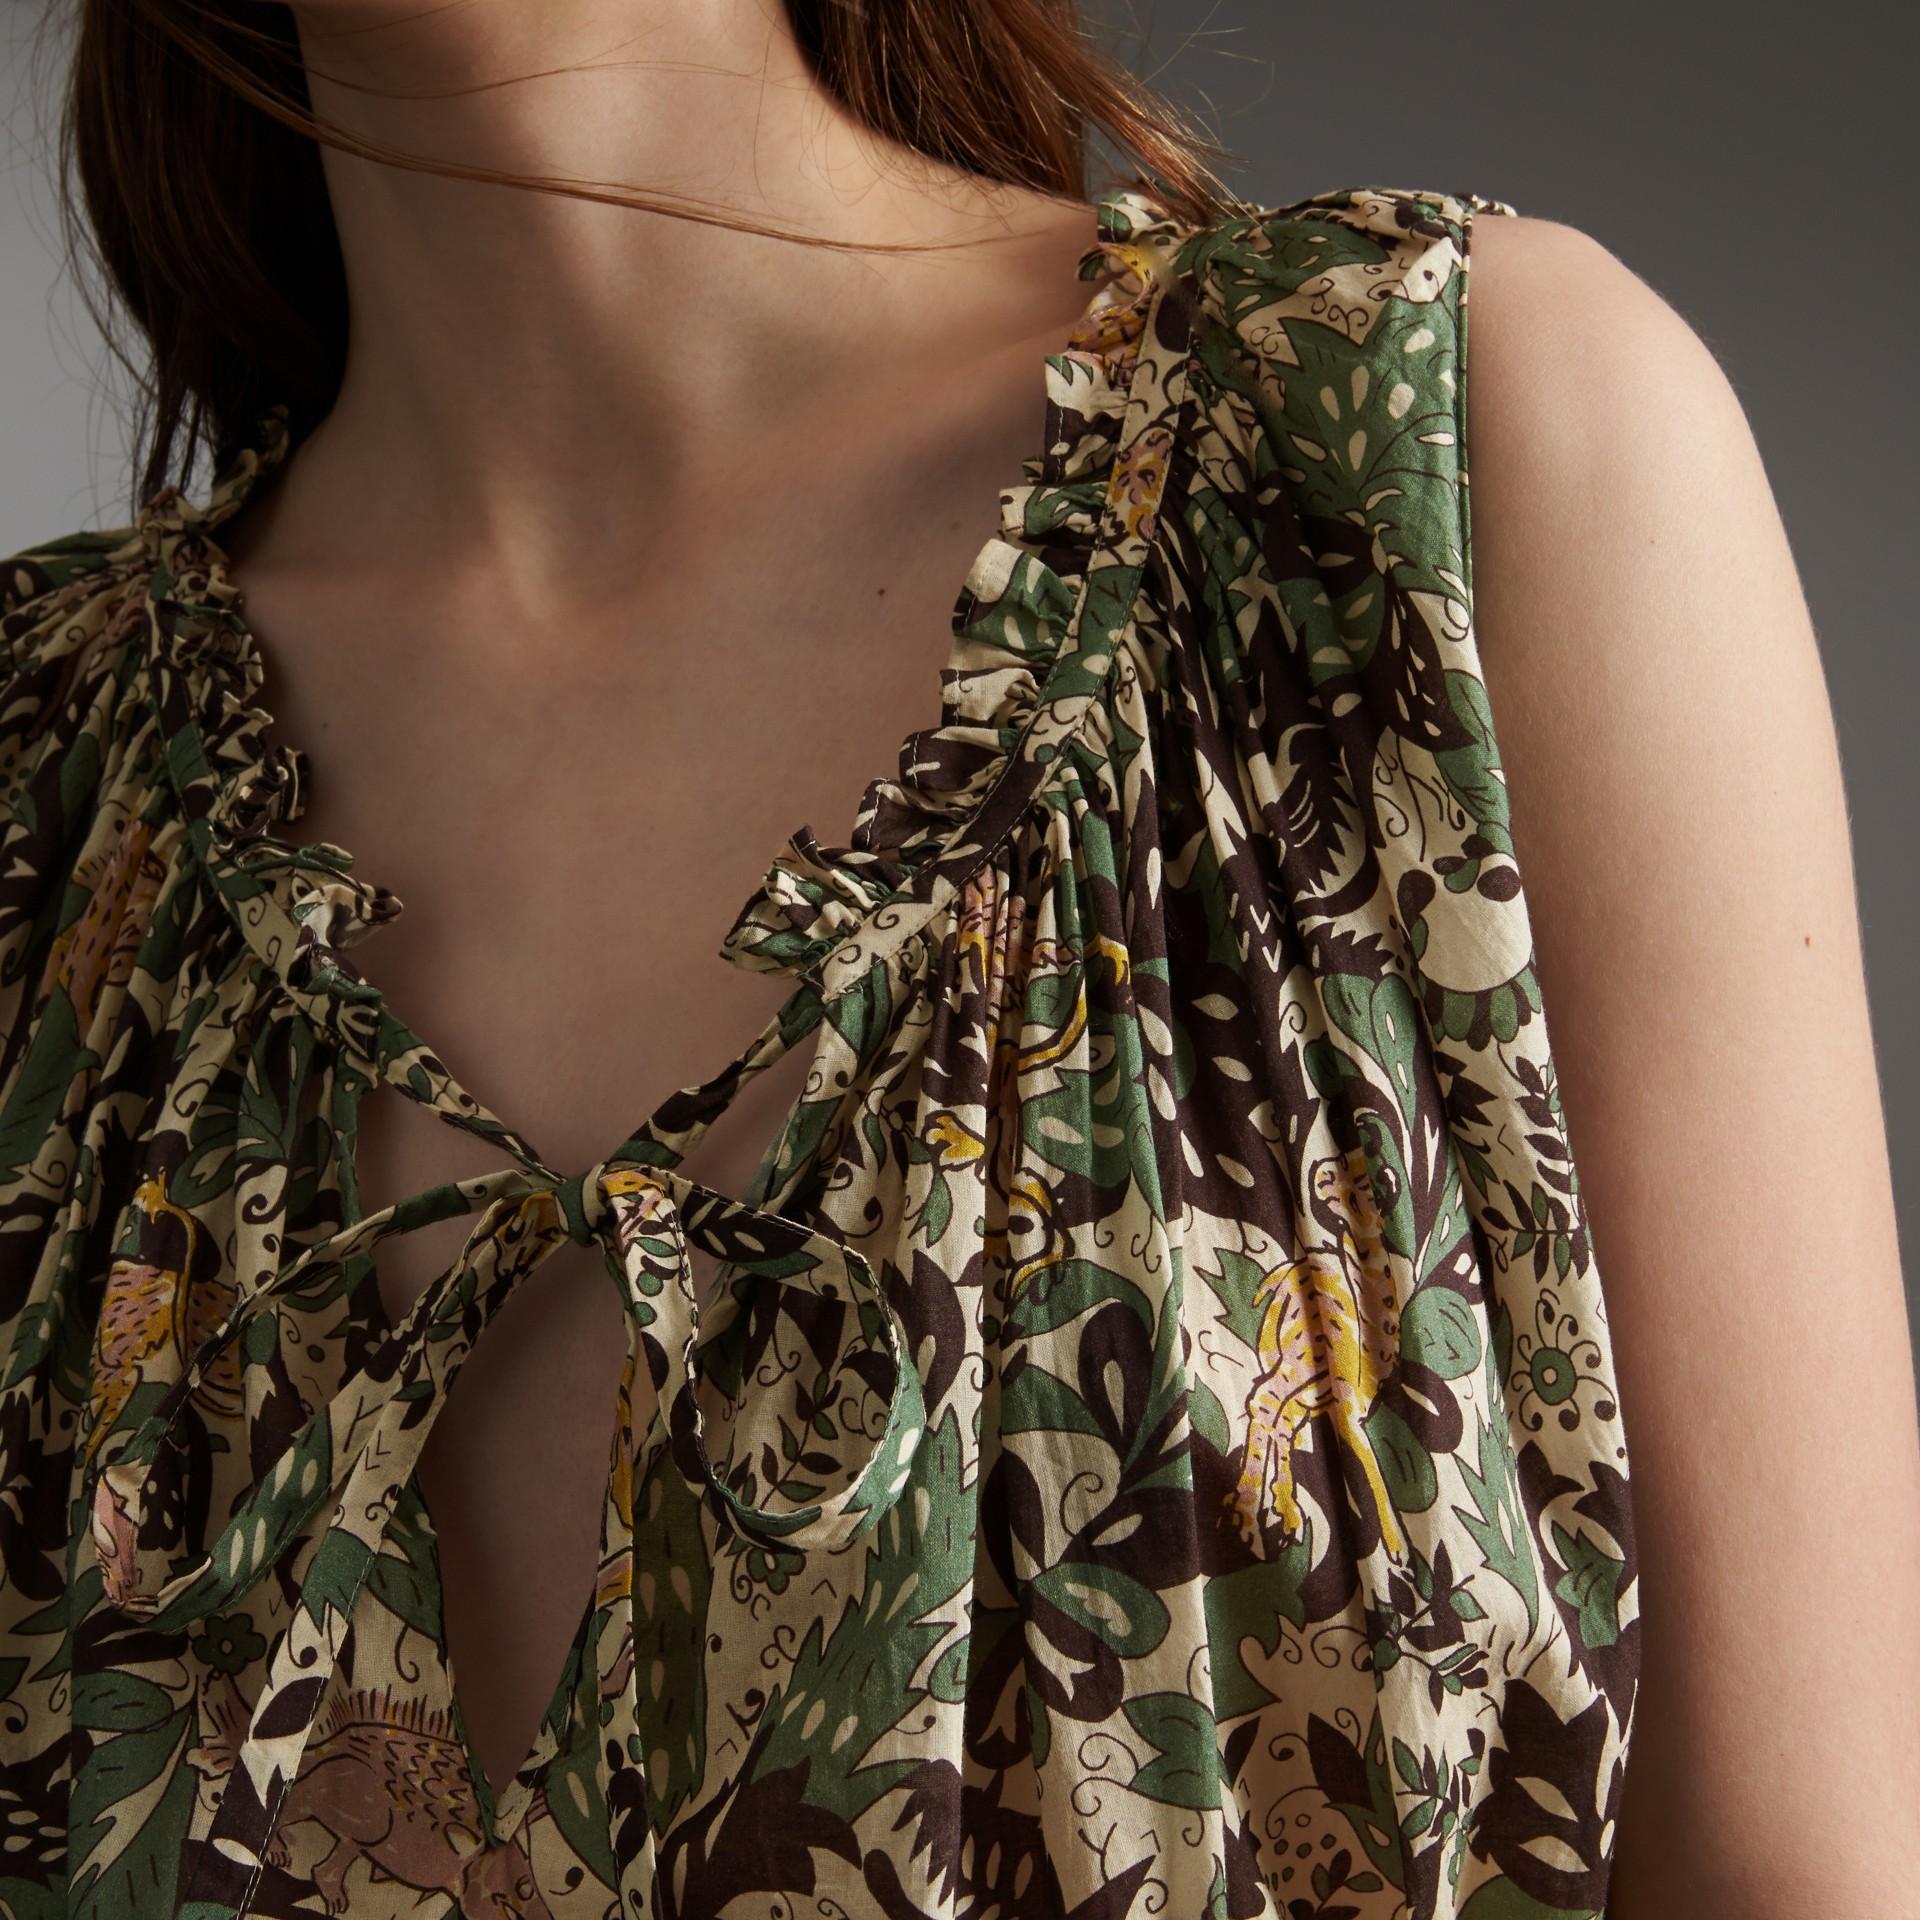 Sleeveless Beasts Print Lightweight Cotton Top - Women | Burberry - gallery image 5